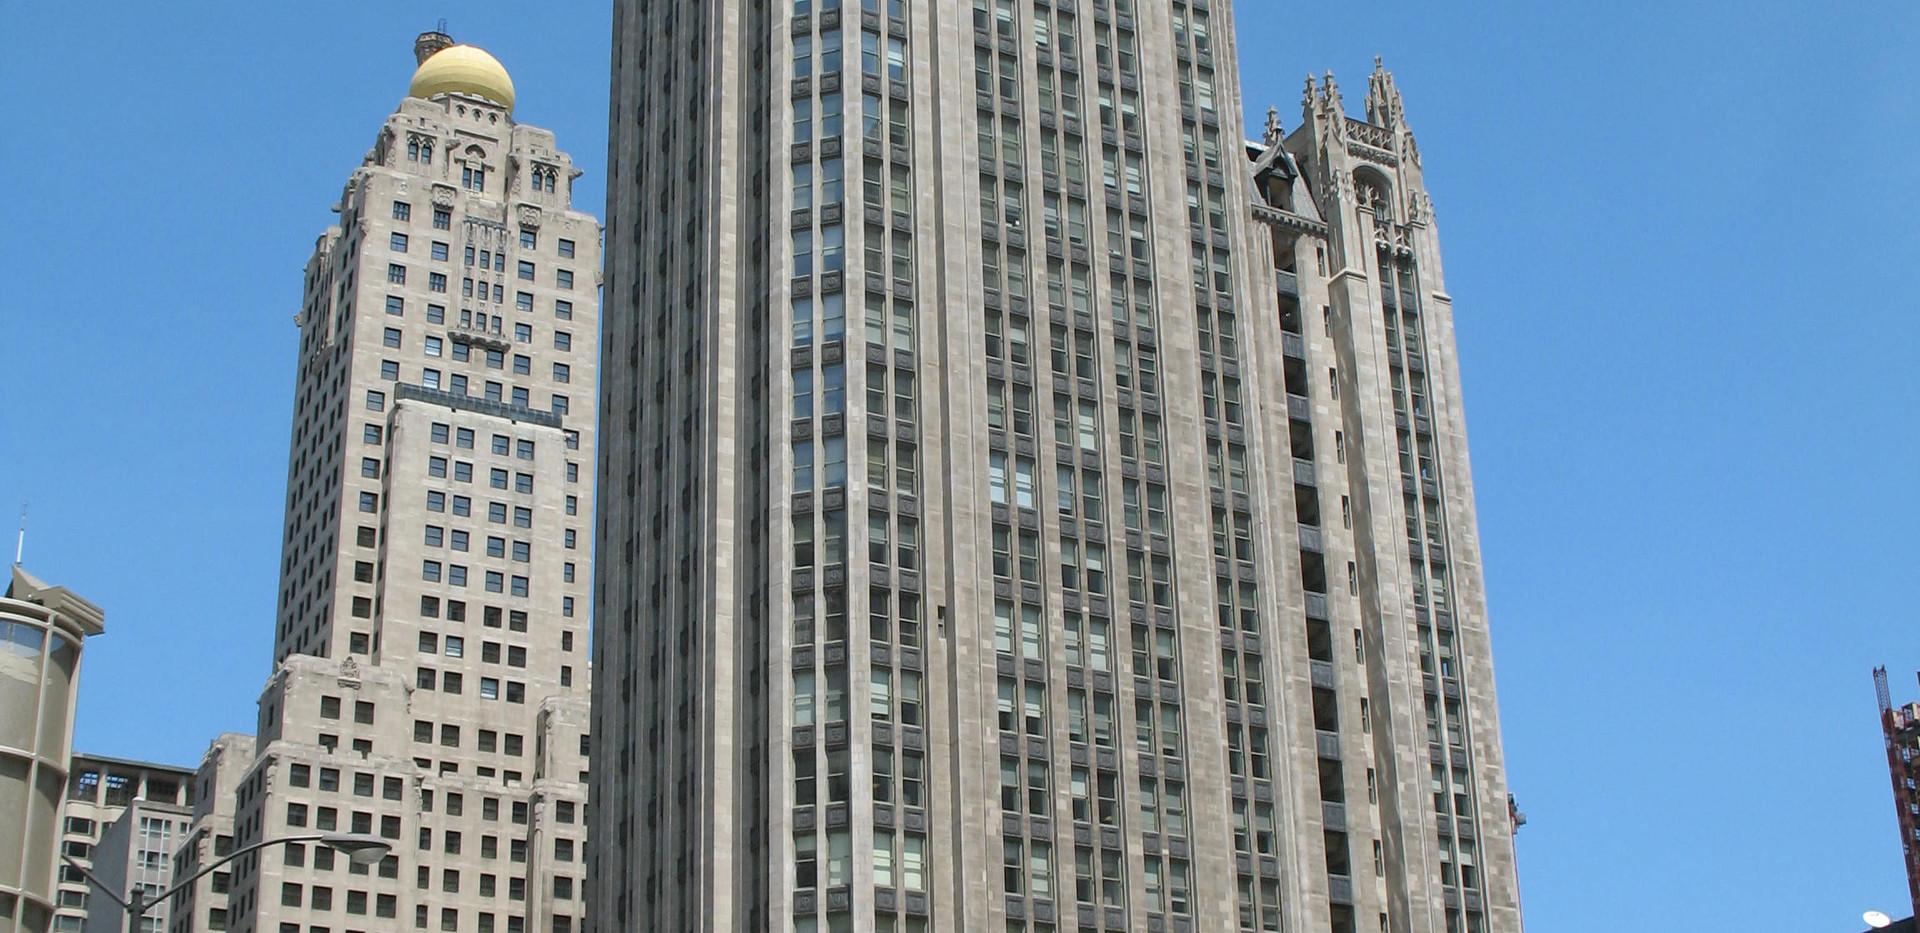 Tribune Tower, Chicago, IL